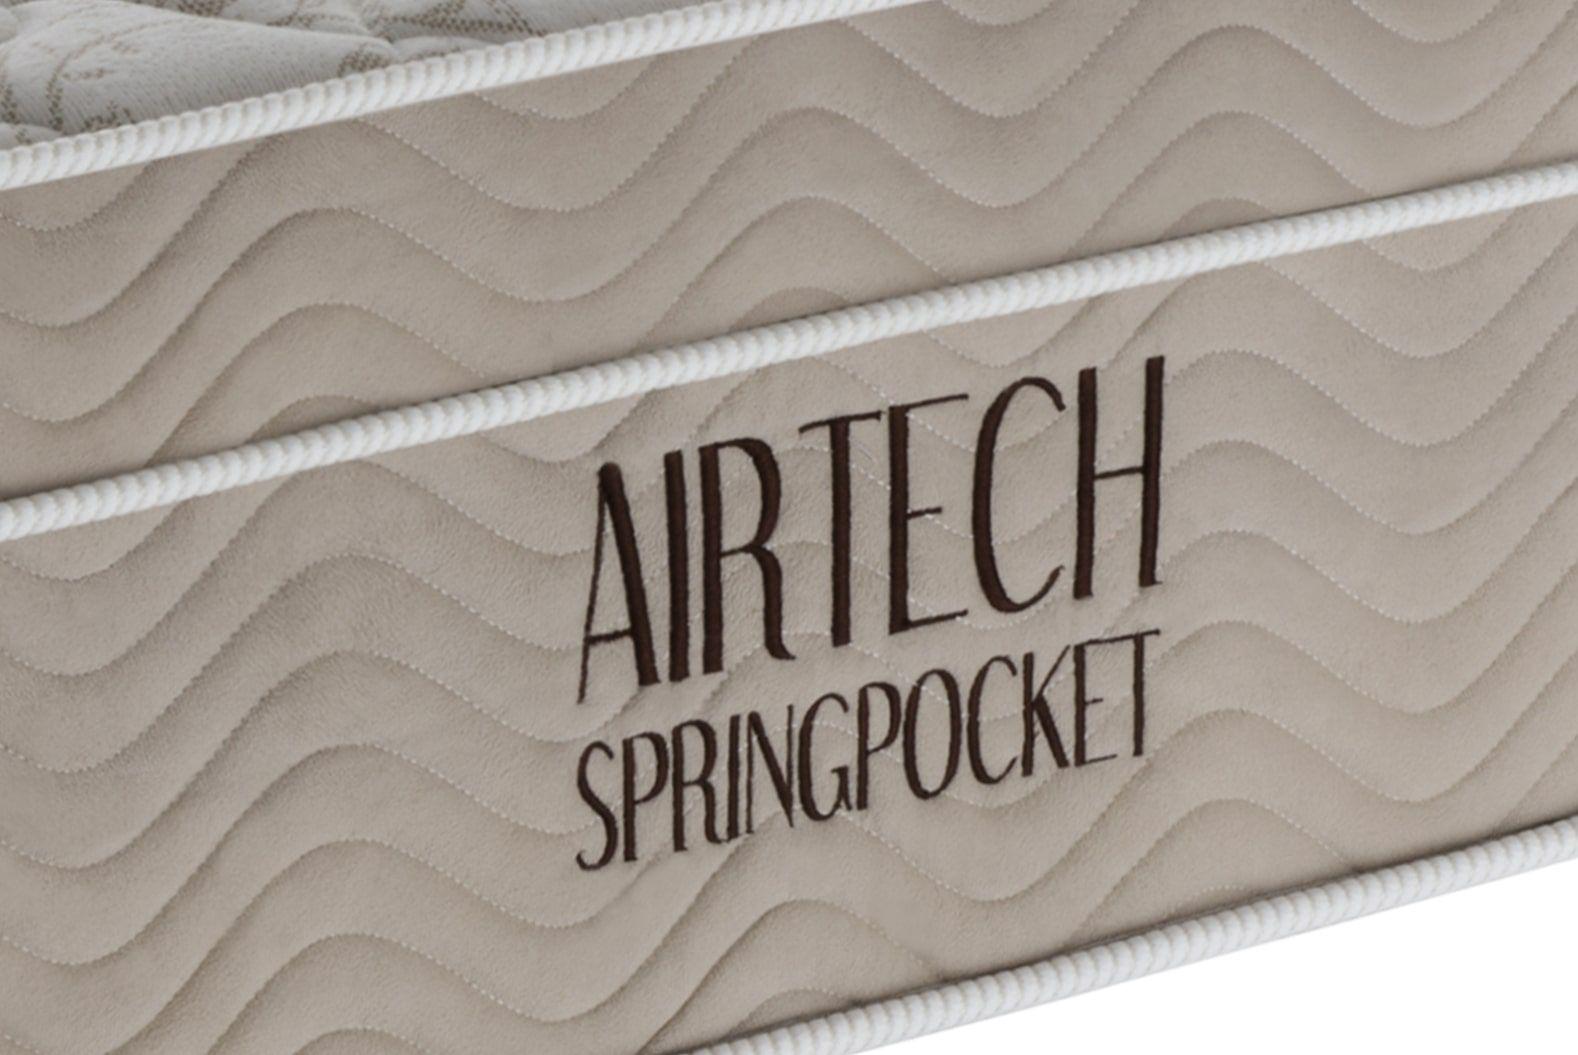 COLCHÃO ORTOBOM AIRTECH SPRING POCKET  VIÚVA (128x188x30cm)